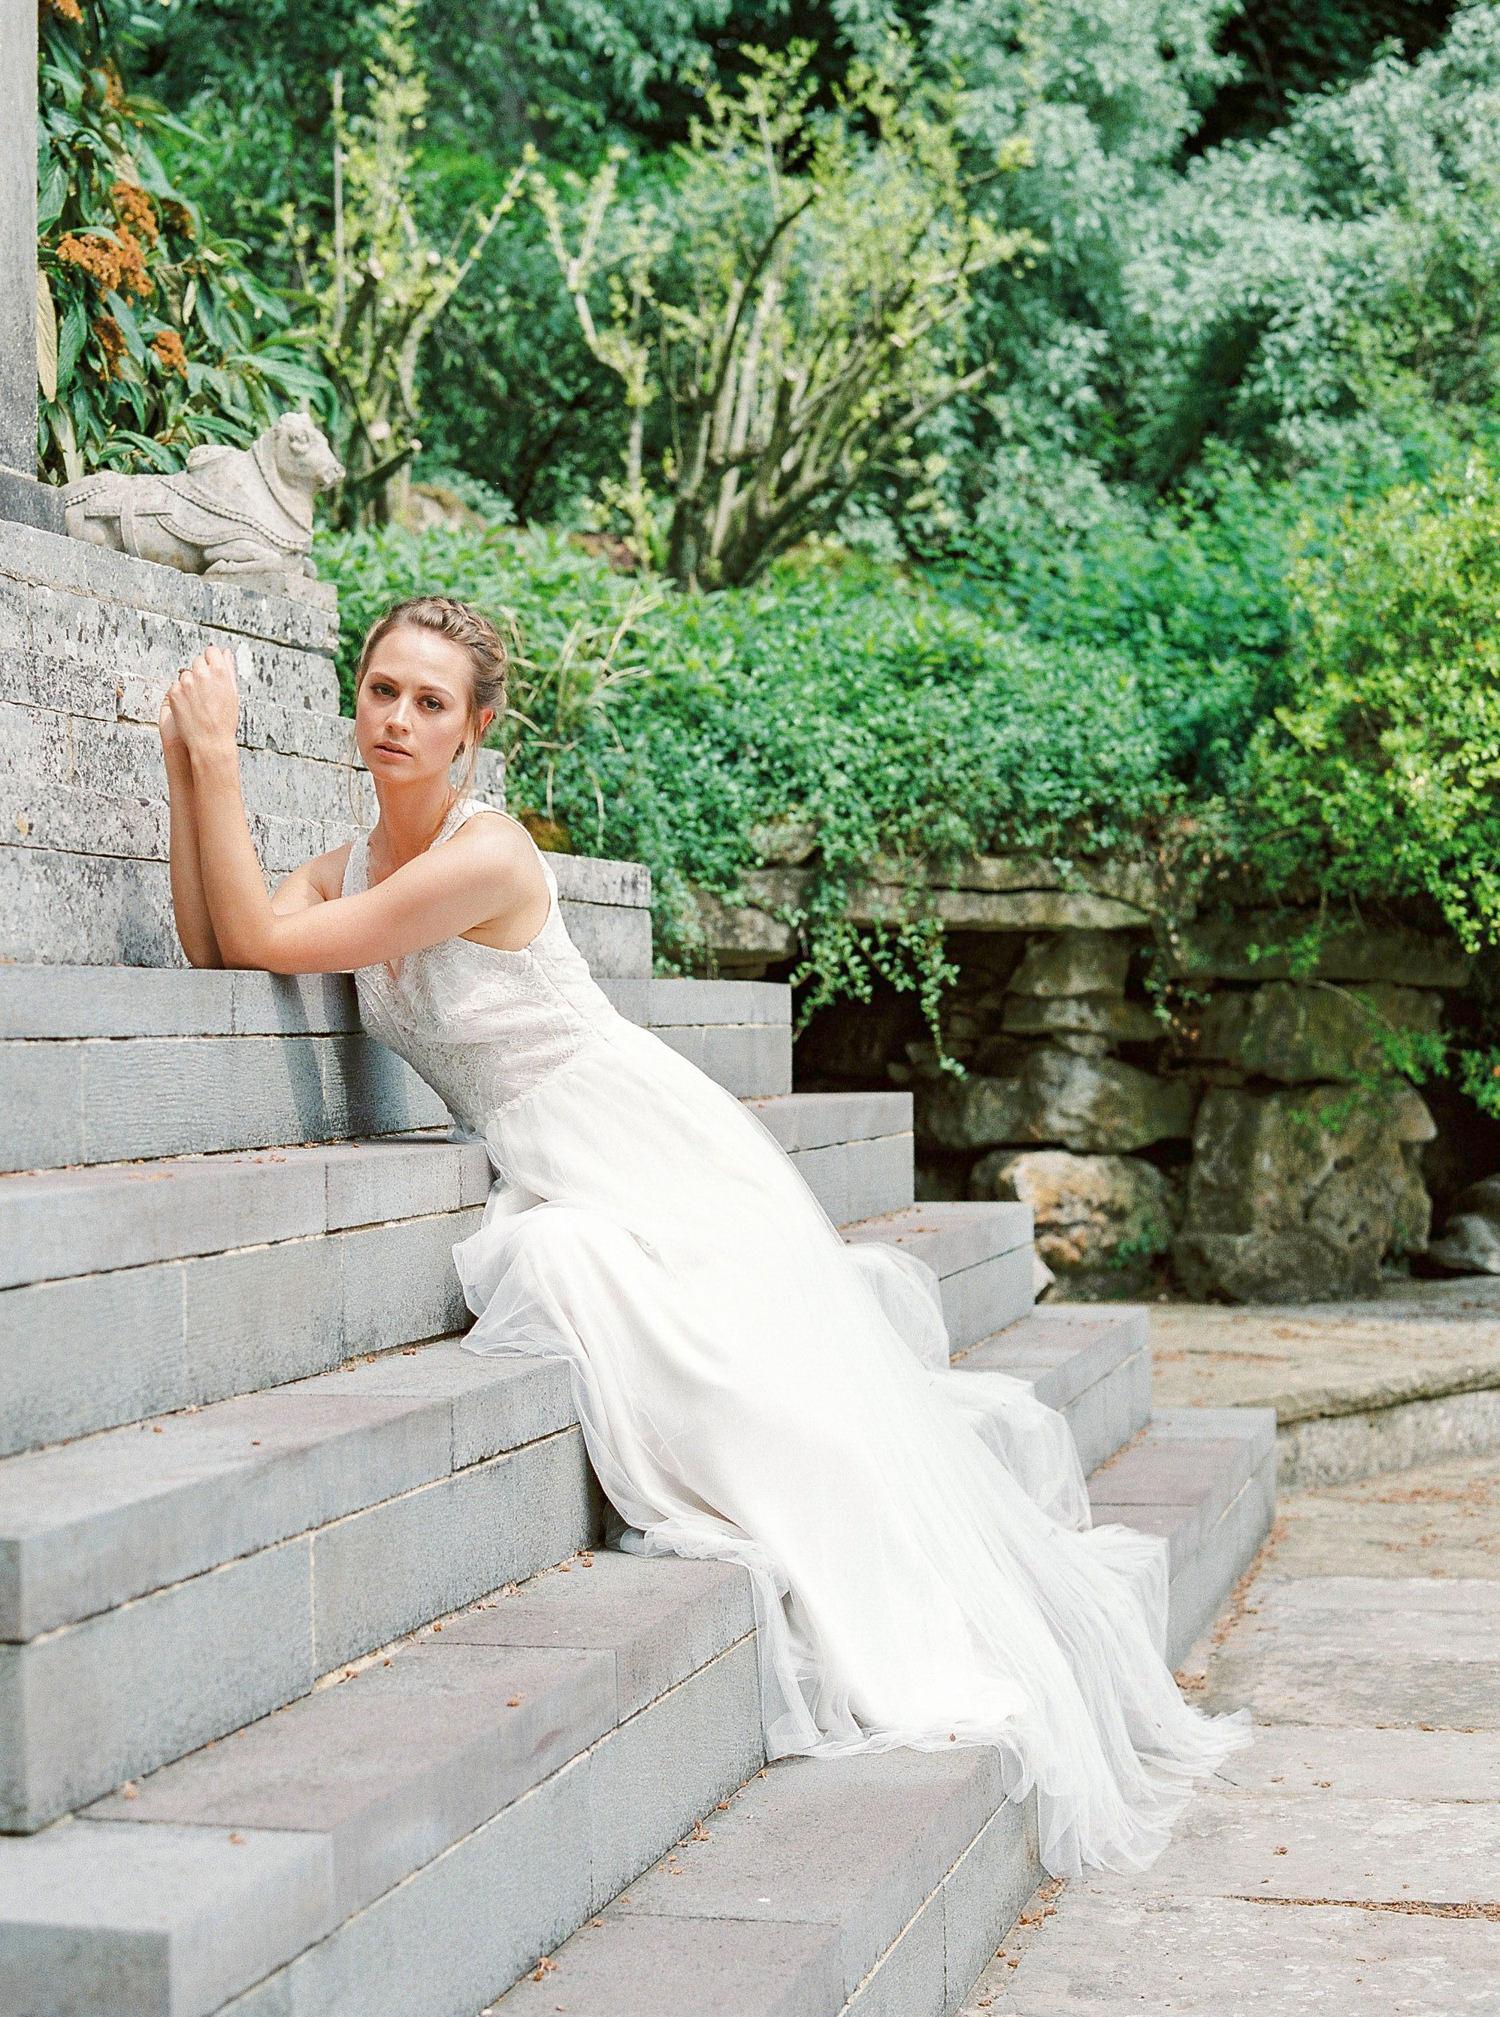 Suzanne Harward, Sezincote House & Gardens